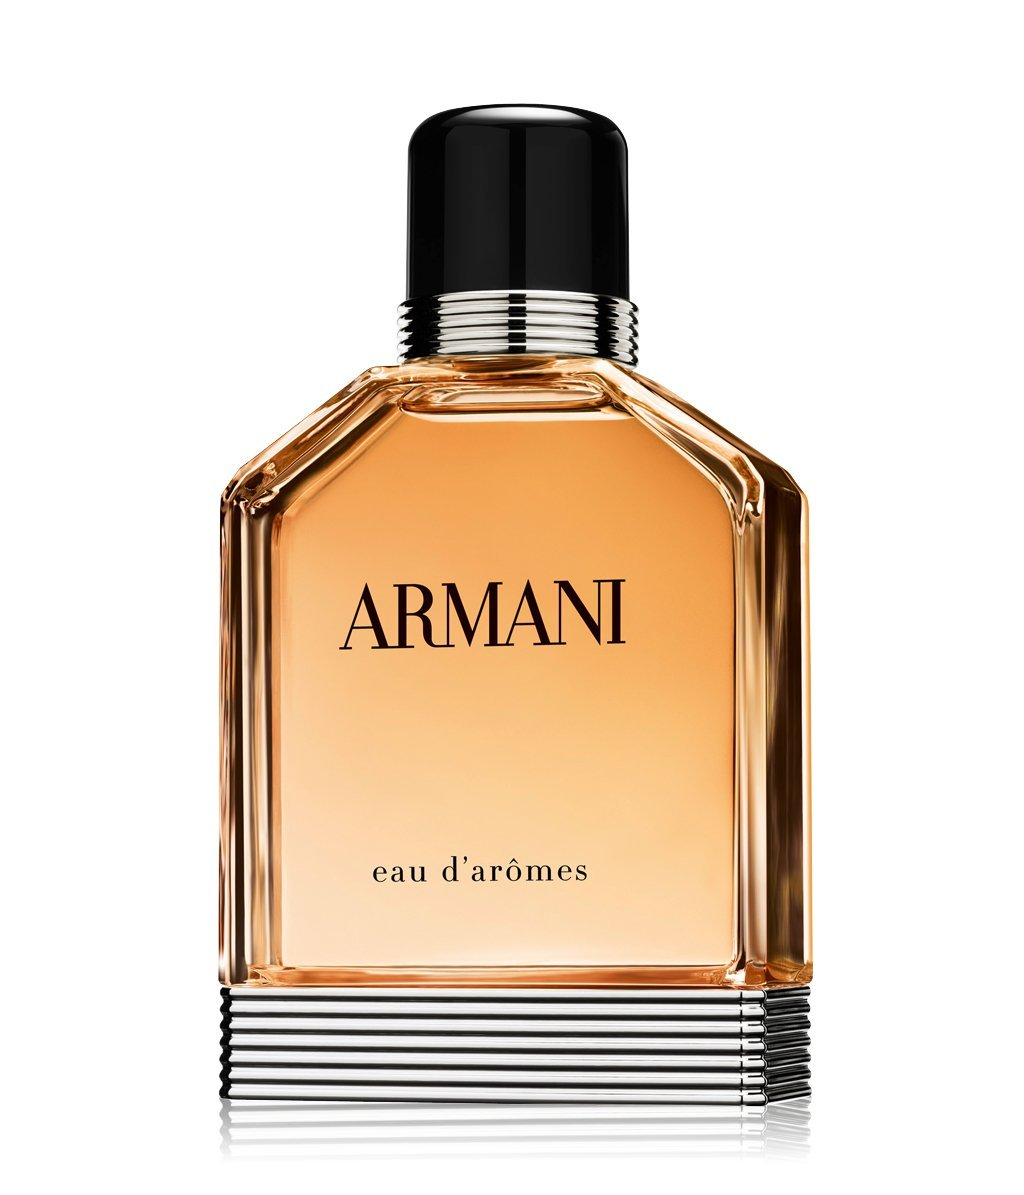 giorgio armani eau d 39 ar mes parfum bestellen flaconi. Black Bedroom Furniture Sets. Home Design Ideas